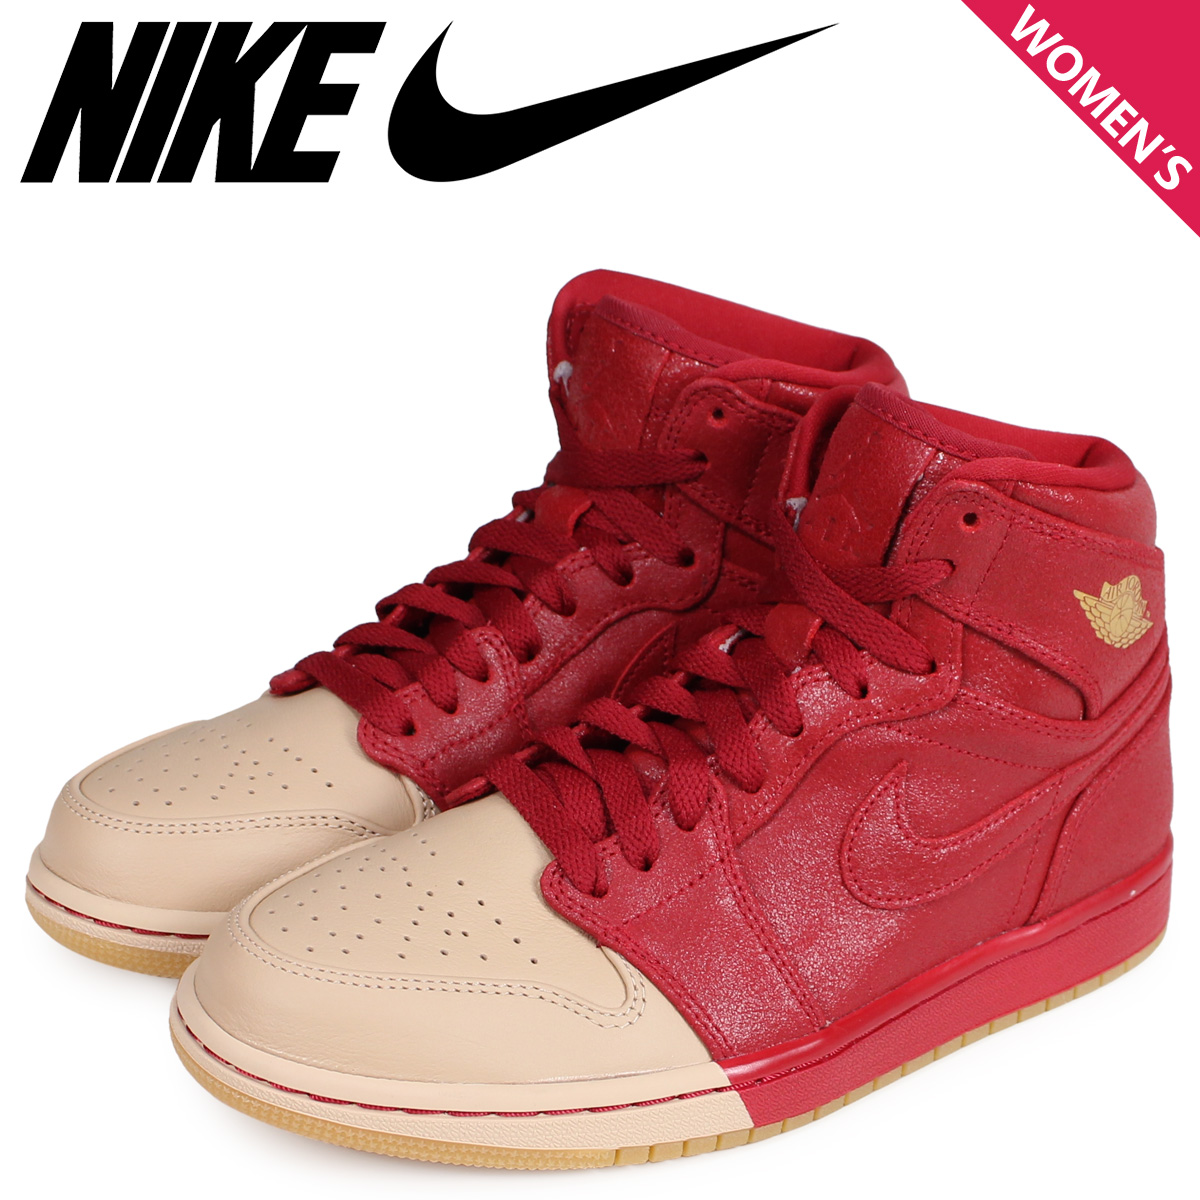 0e96e1183f6 NIKE Nike Air Jordan 1 nostalgic high sneakers Lady's WMNS AIR JORDAN 1  RETRO HIGH red ...